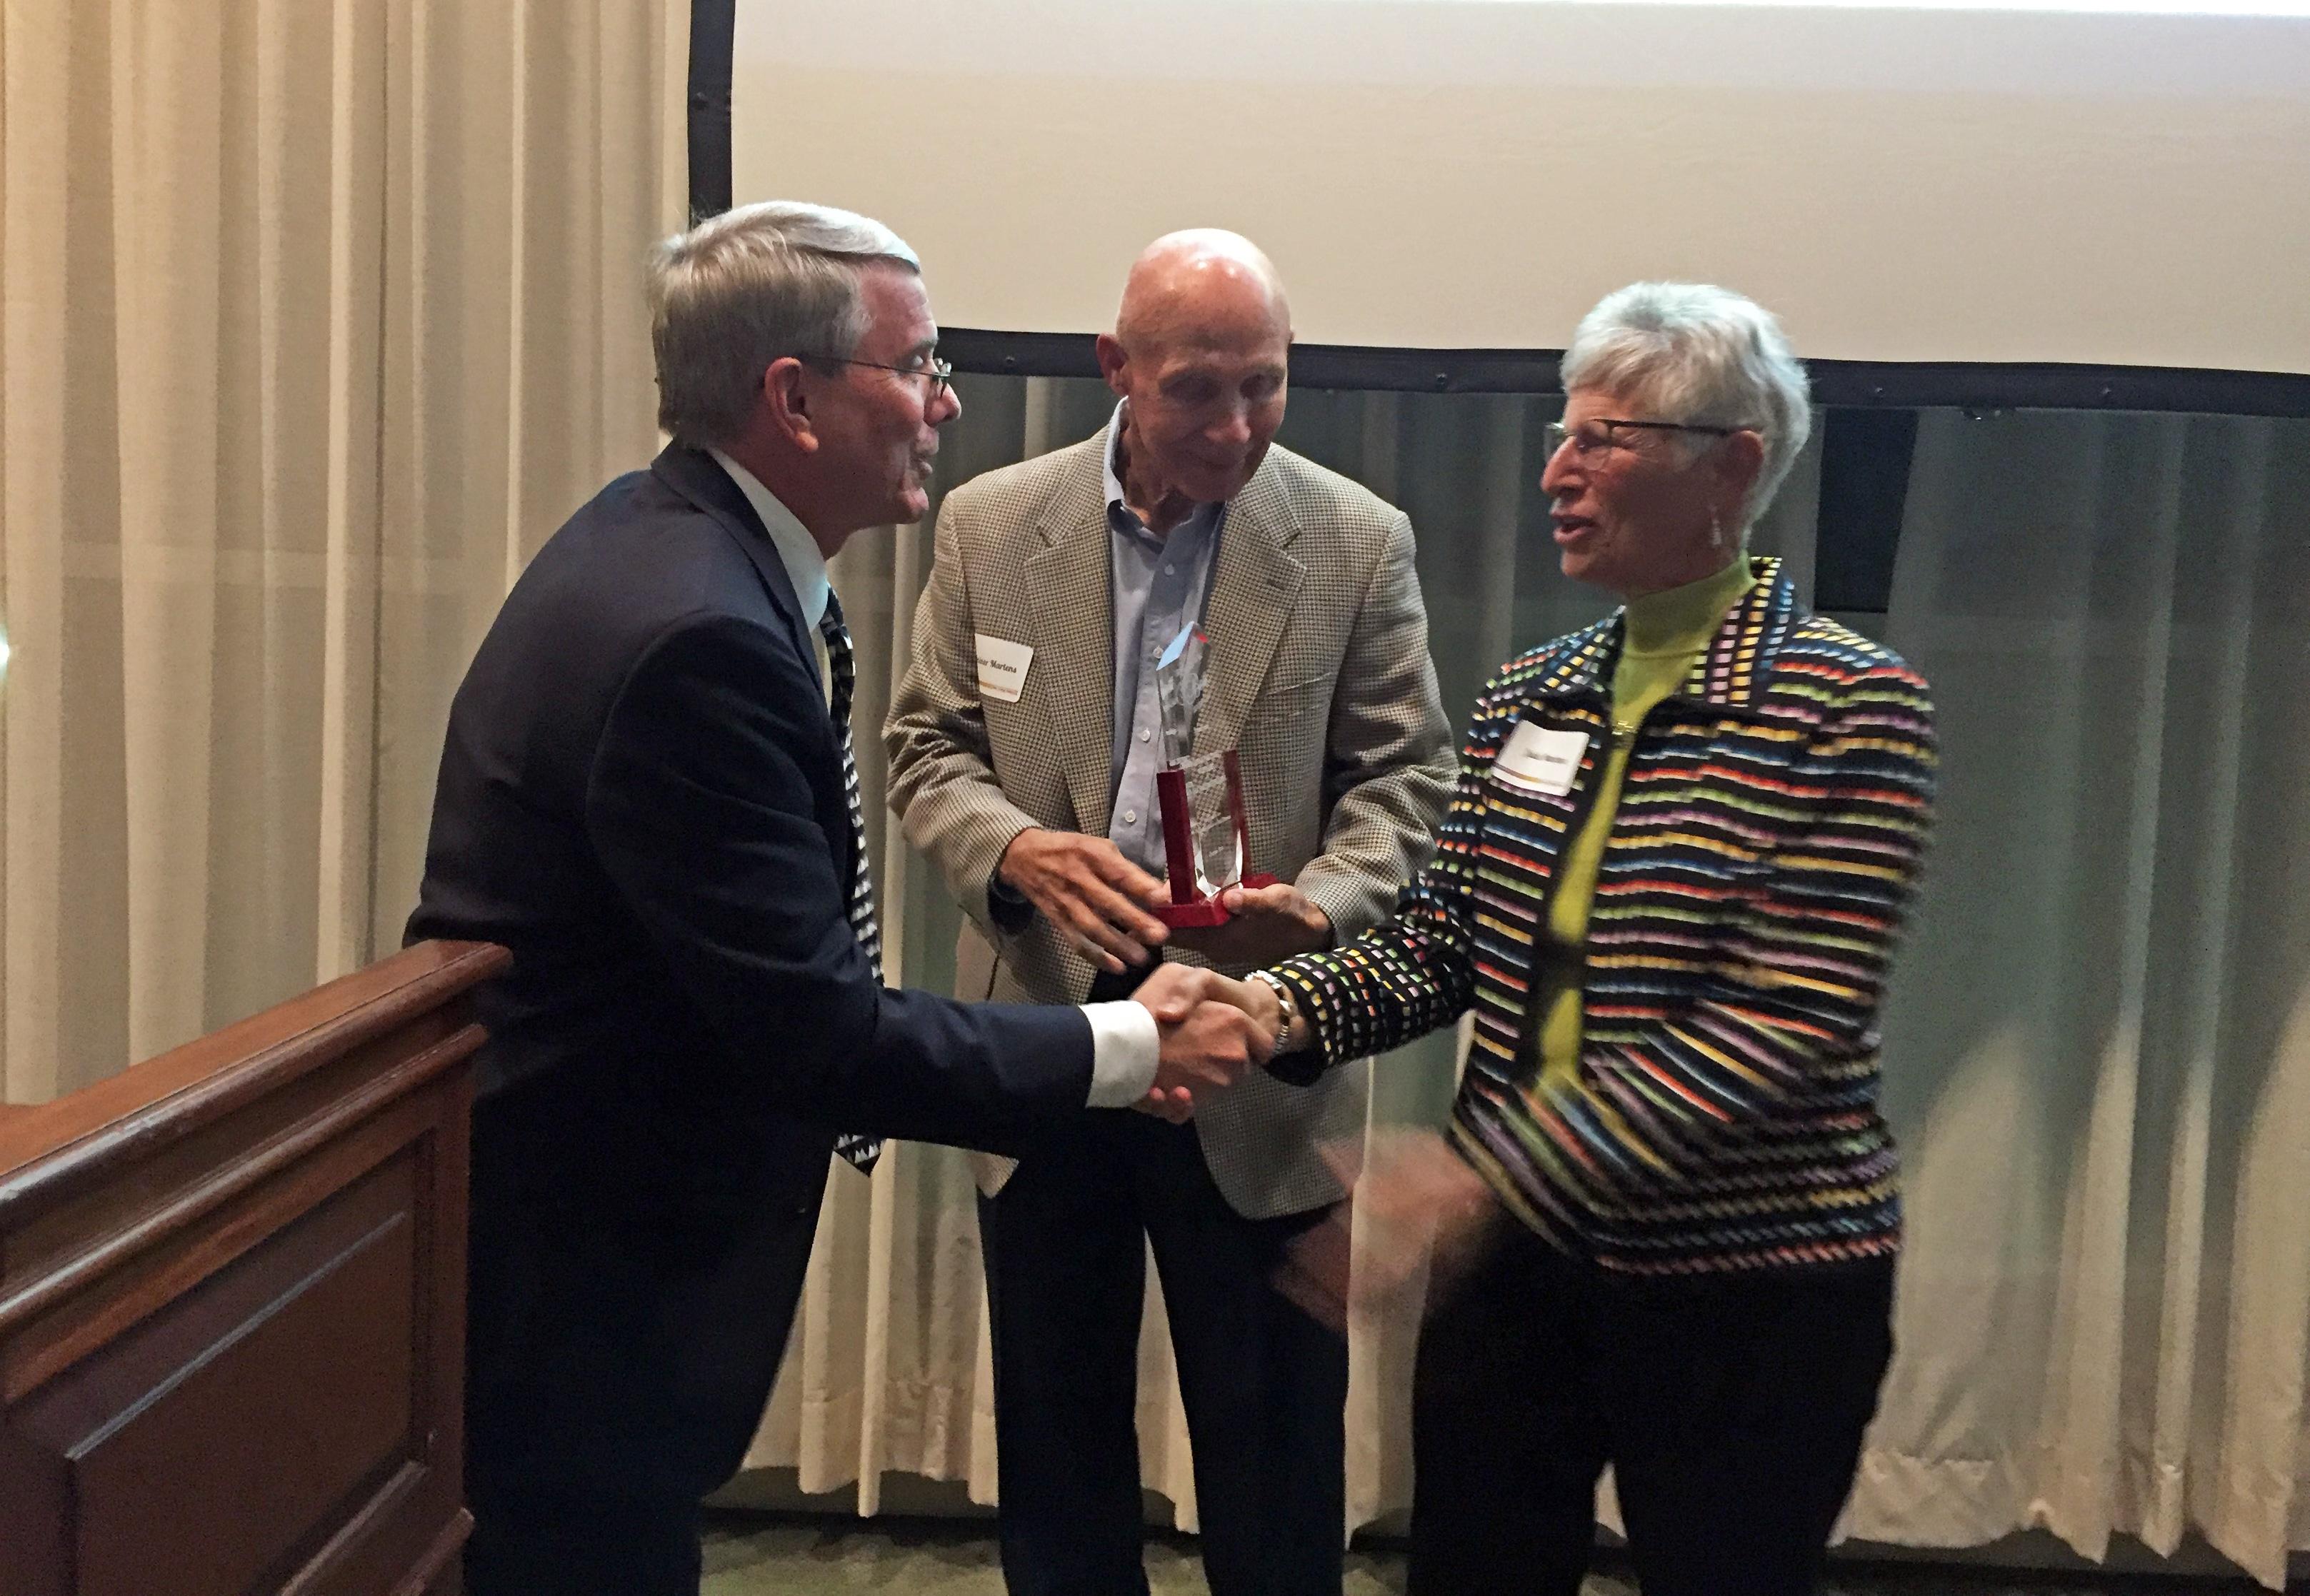 Commissioner Hays presents Partnership Award to Rainer and Julie Martens